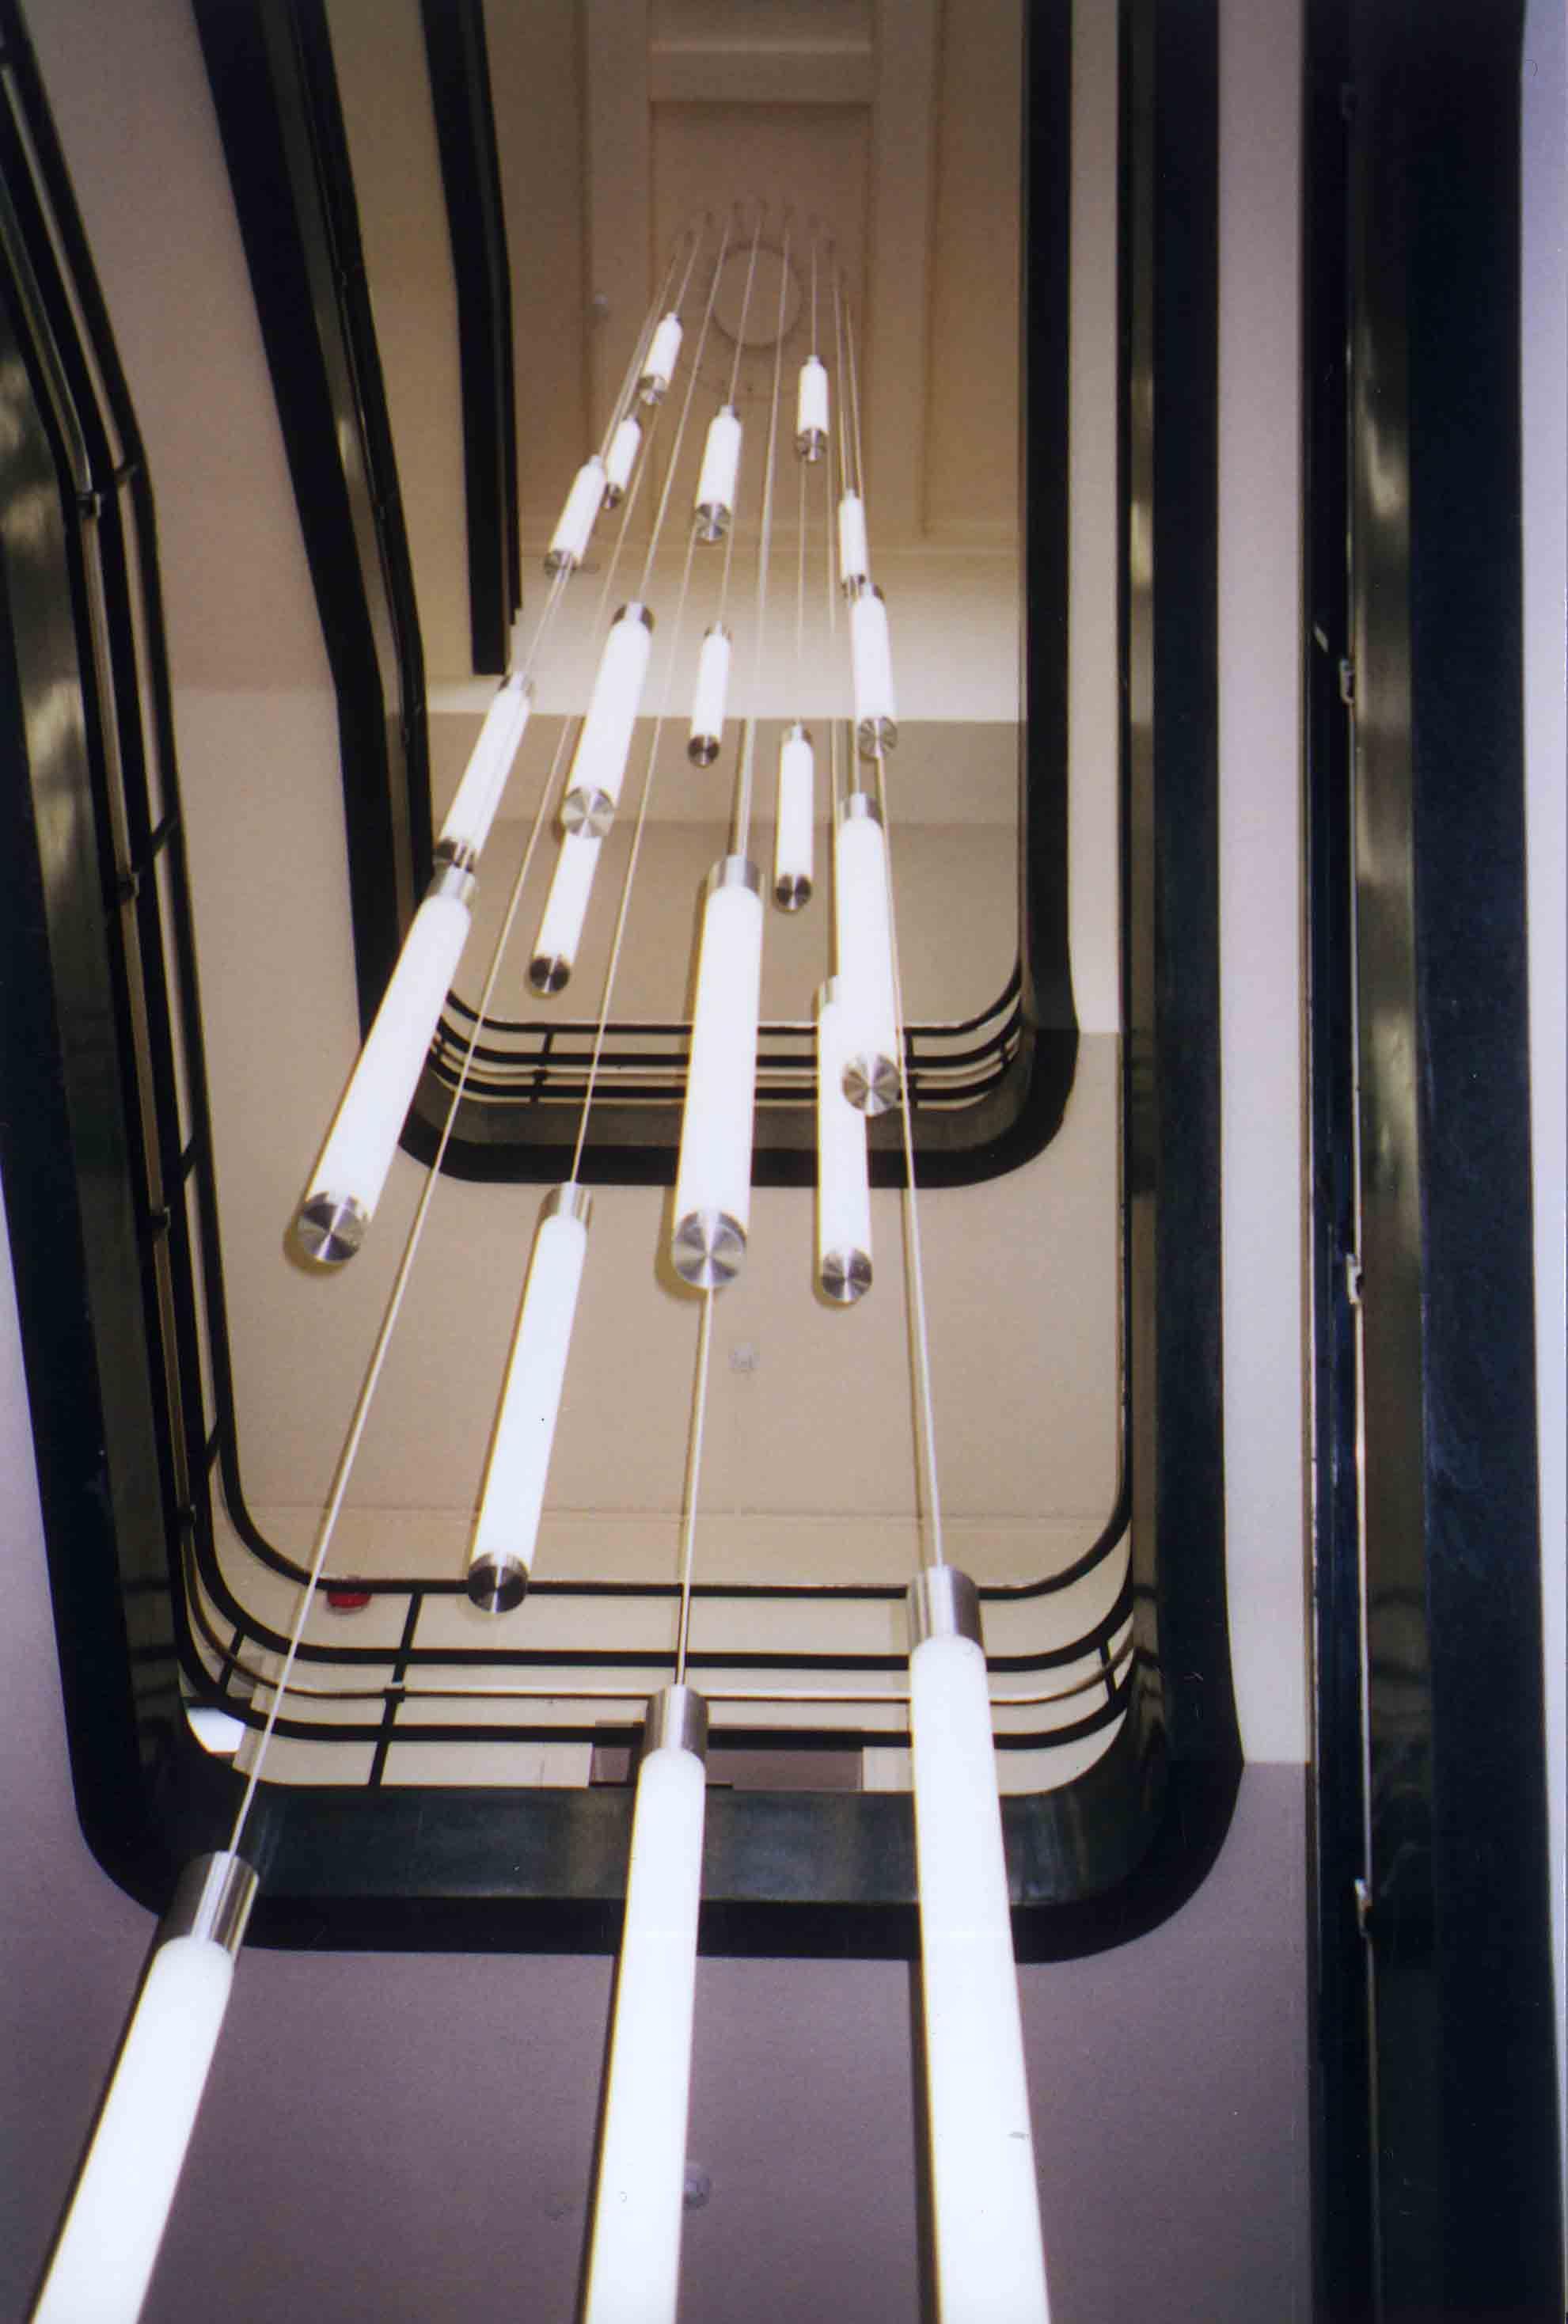 52 Best Staircase Lighting Images On Pinterest: Stair Lighting Ideas